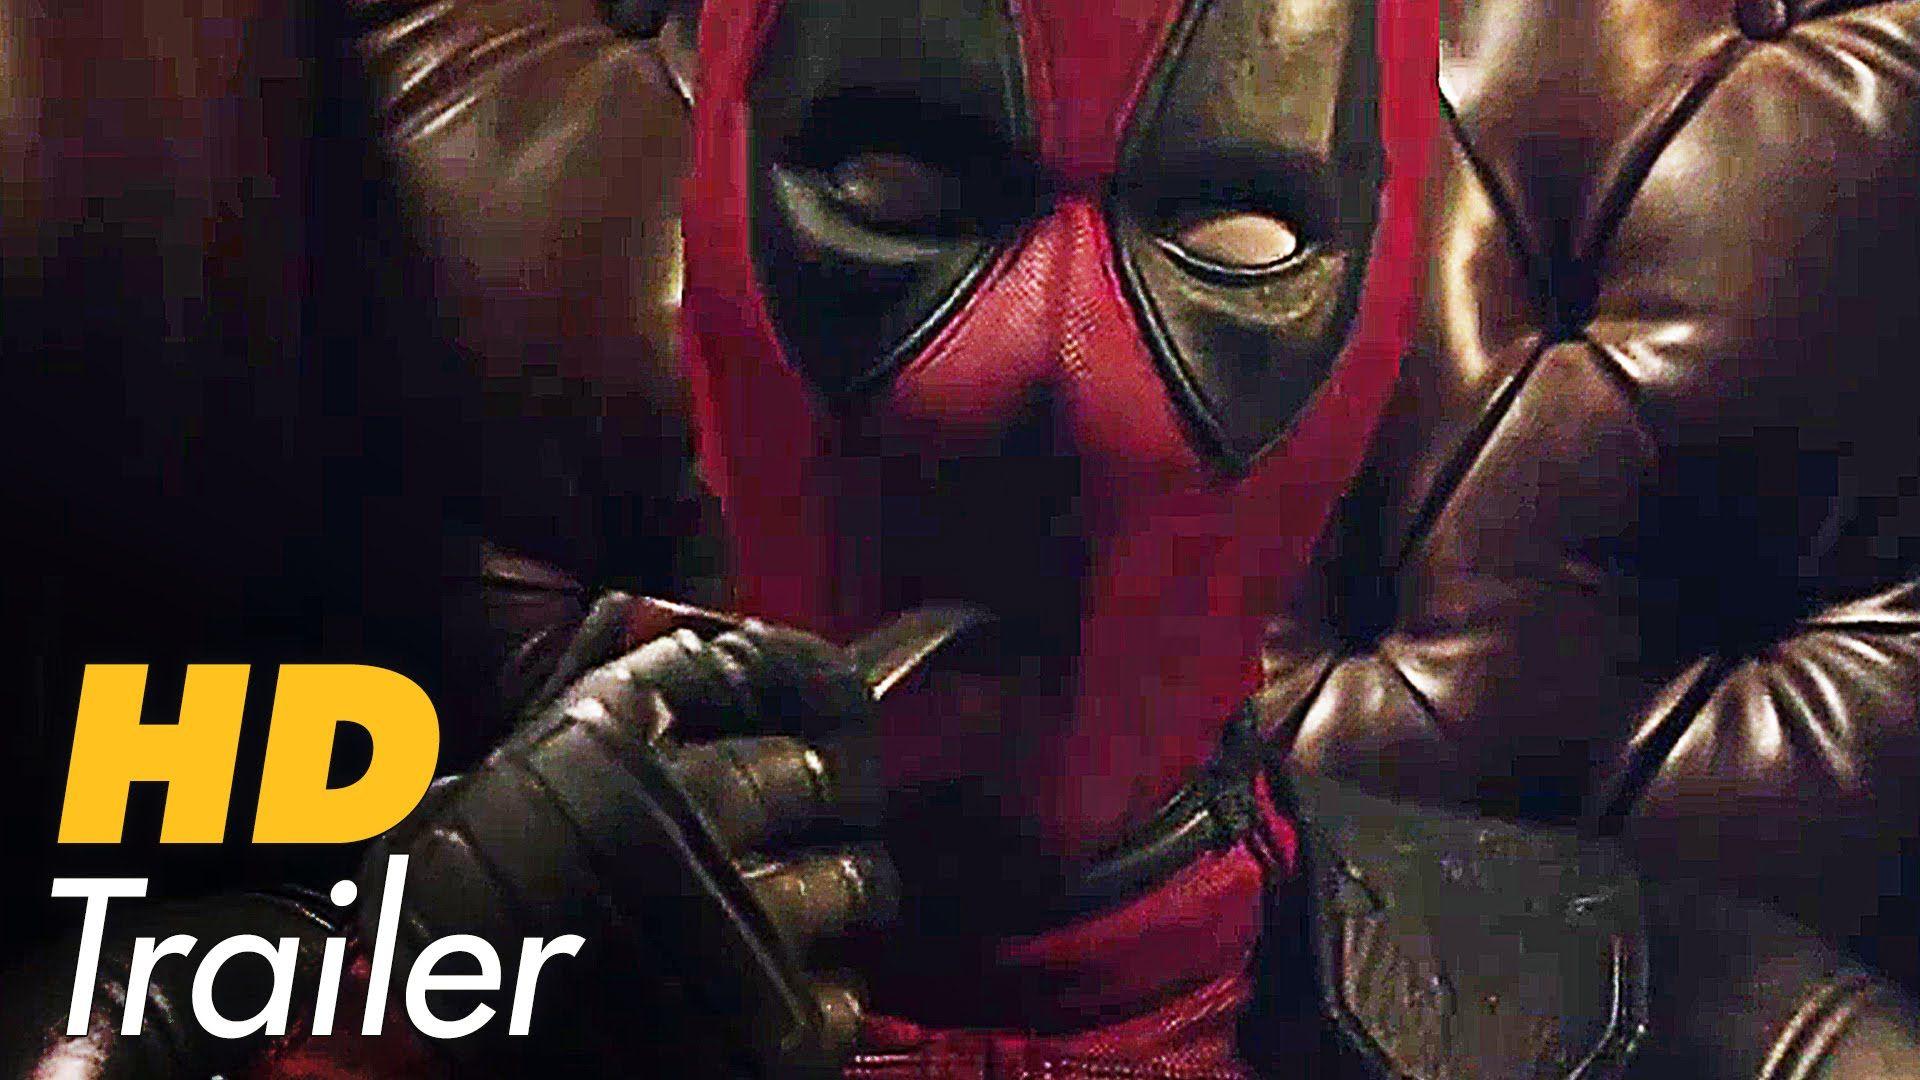 DEADPOOL Trailer Trailer (2016) Marvel Superhero Movie | Your name ...